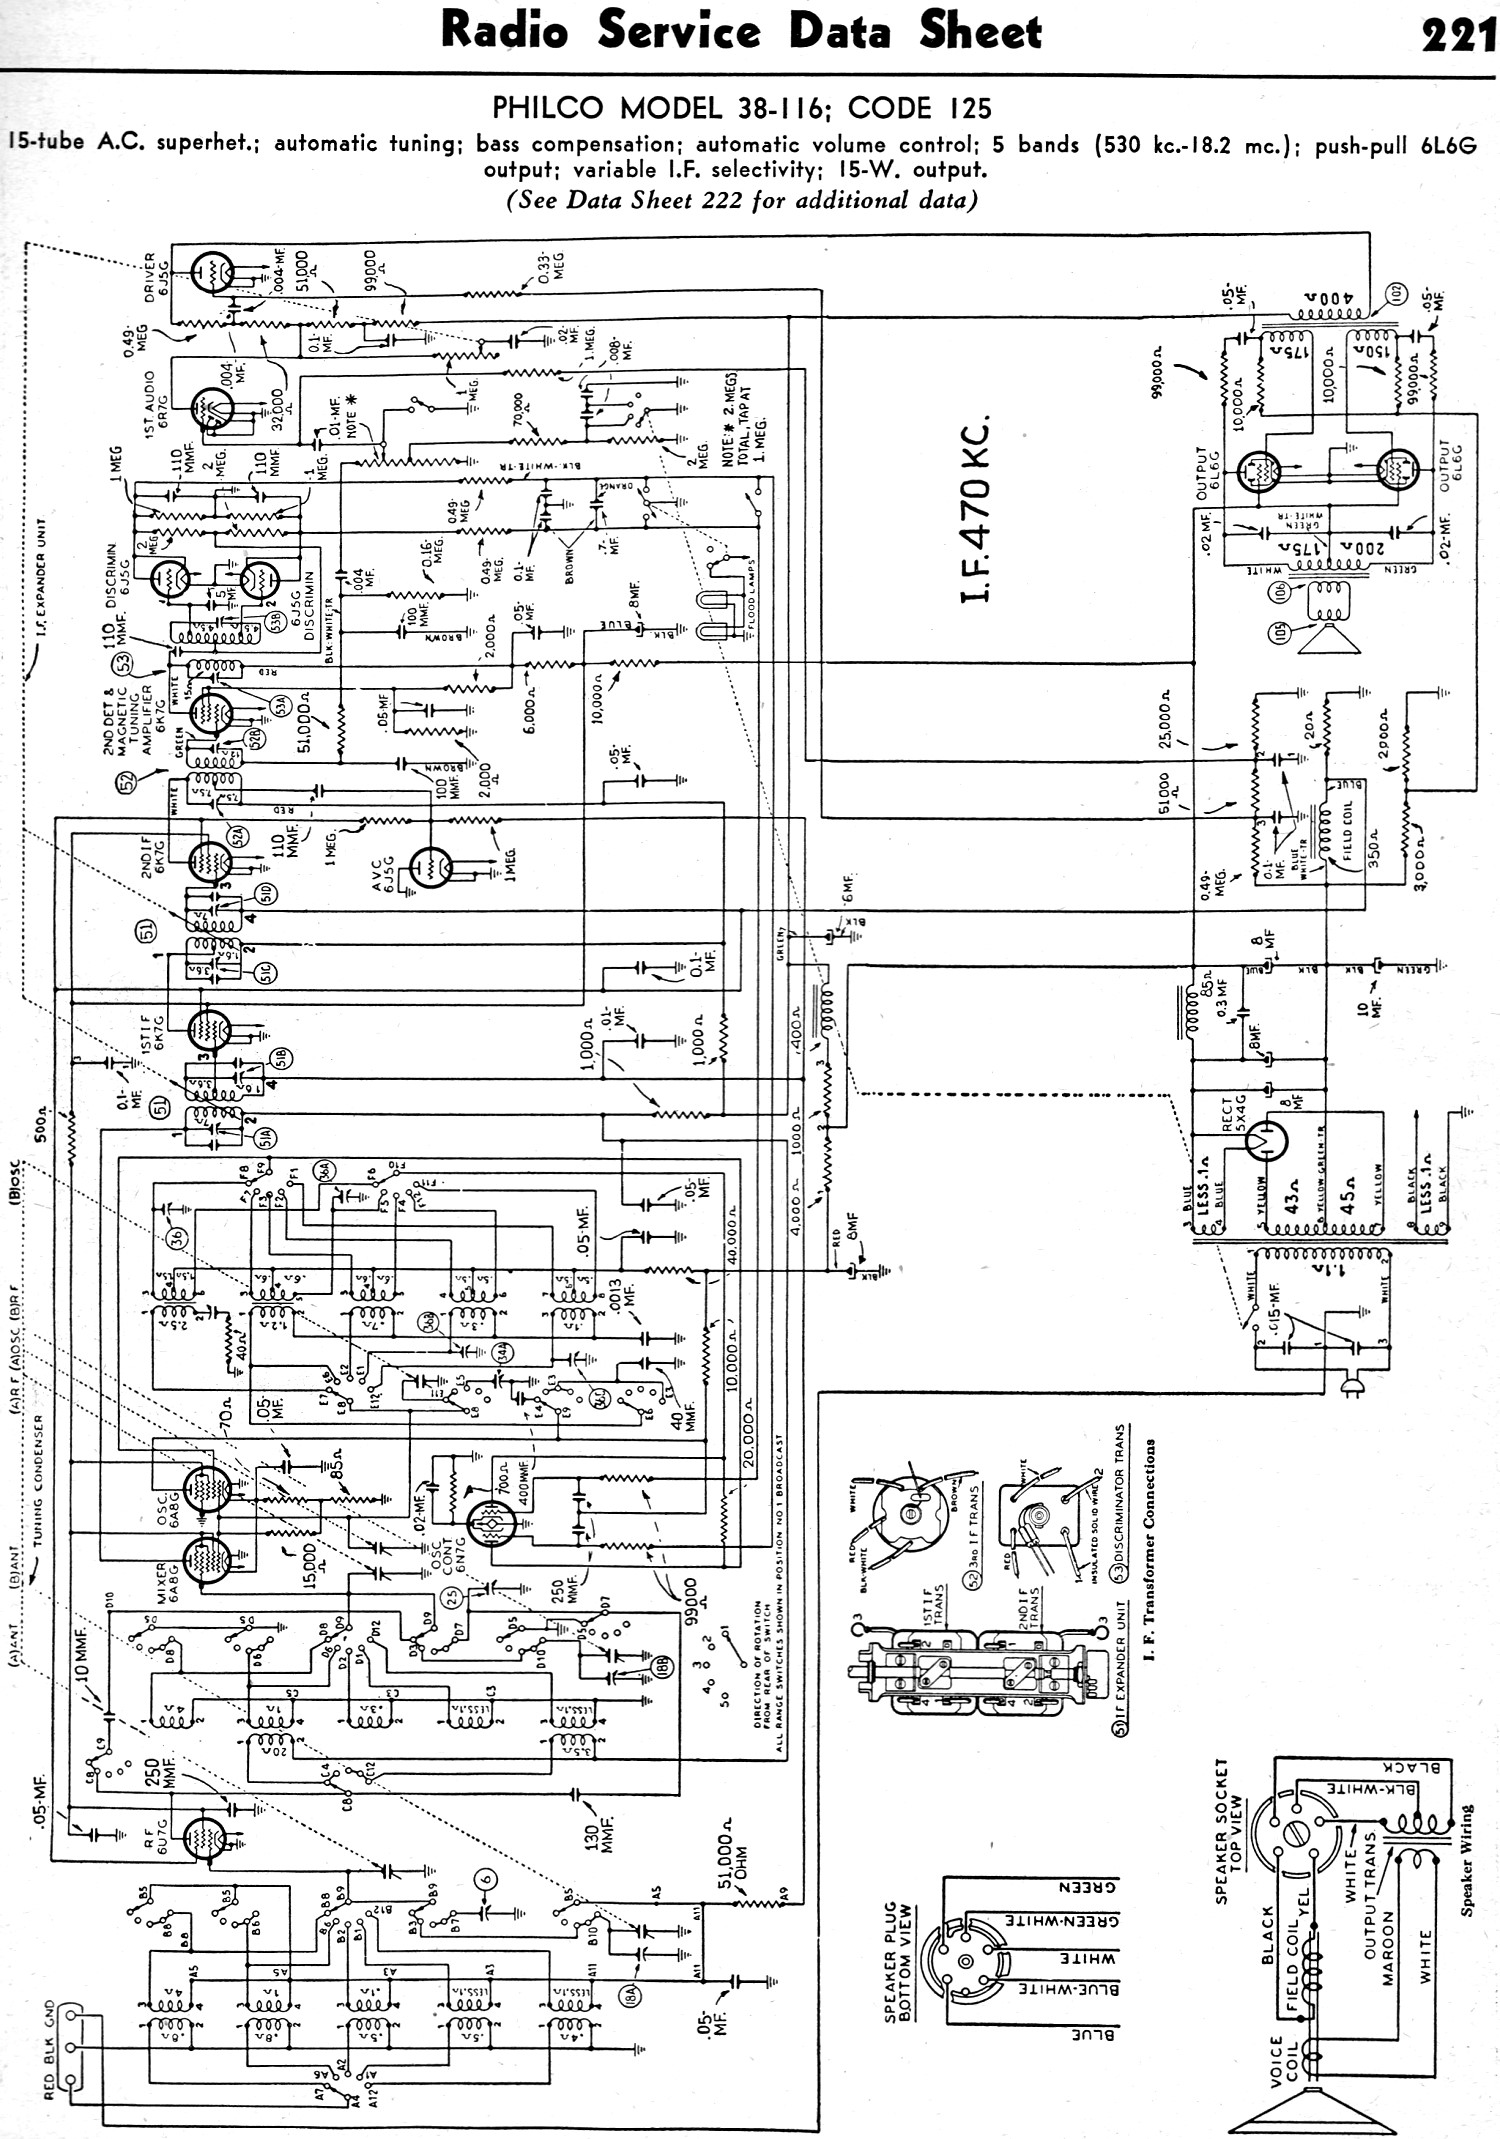 Philco Model 38 116 Code 125 February Radio Craft